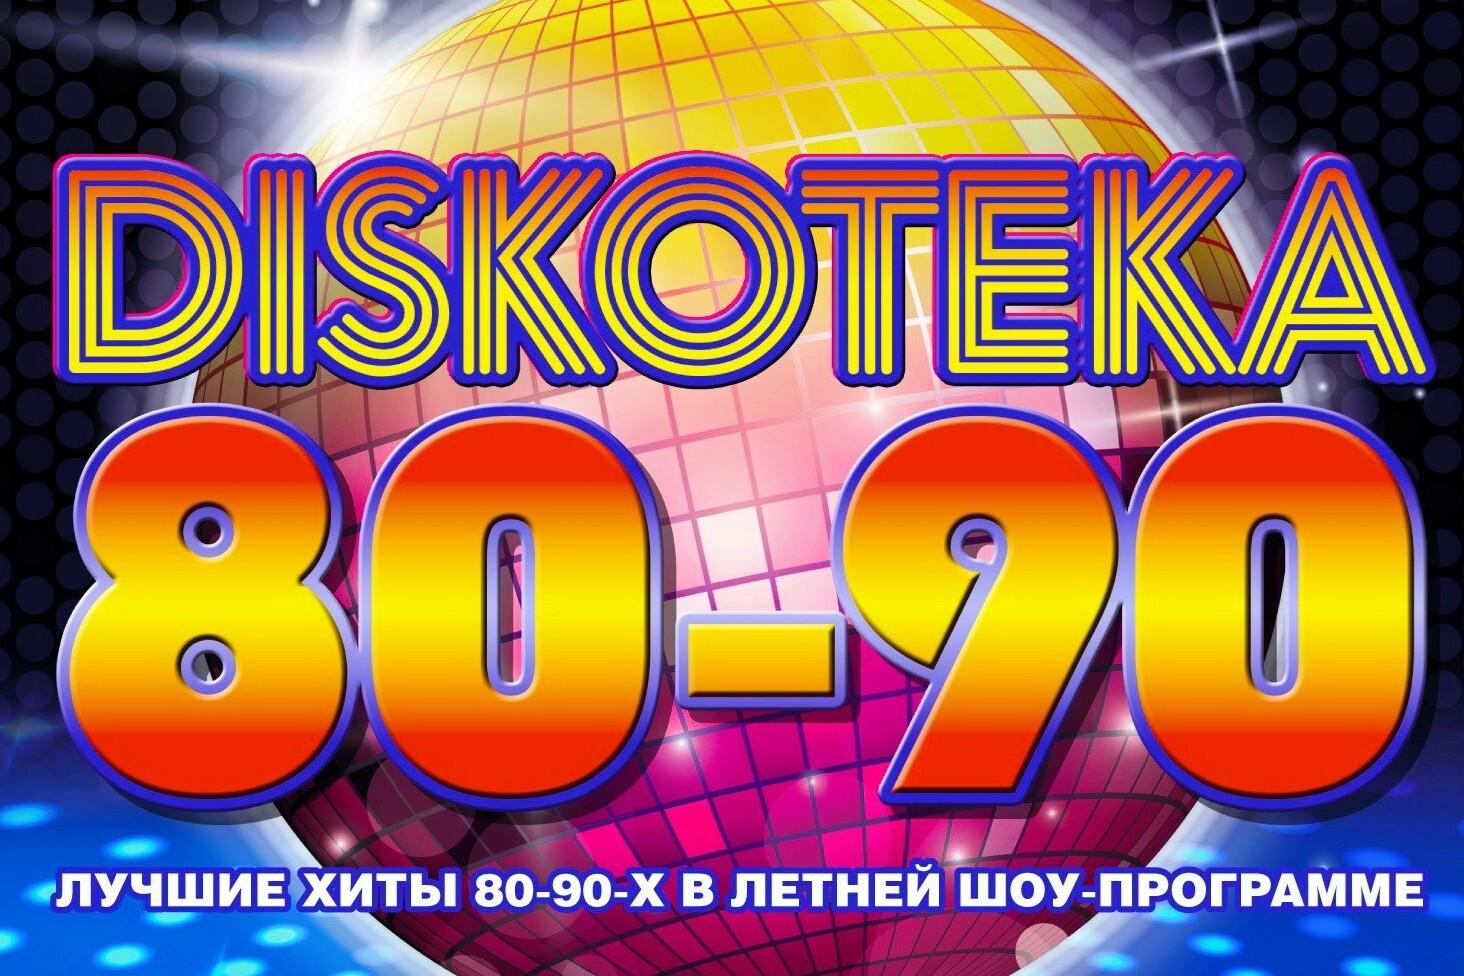 DISKOTEKA 80-90-Х